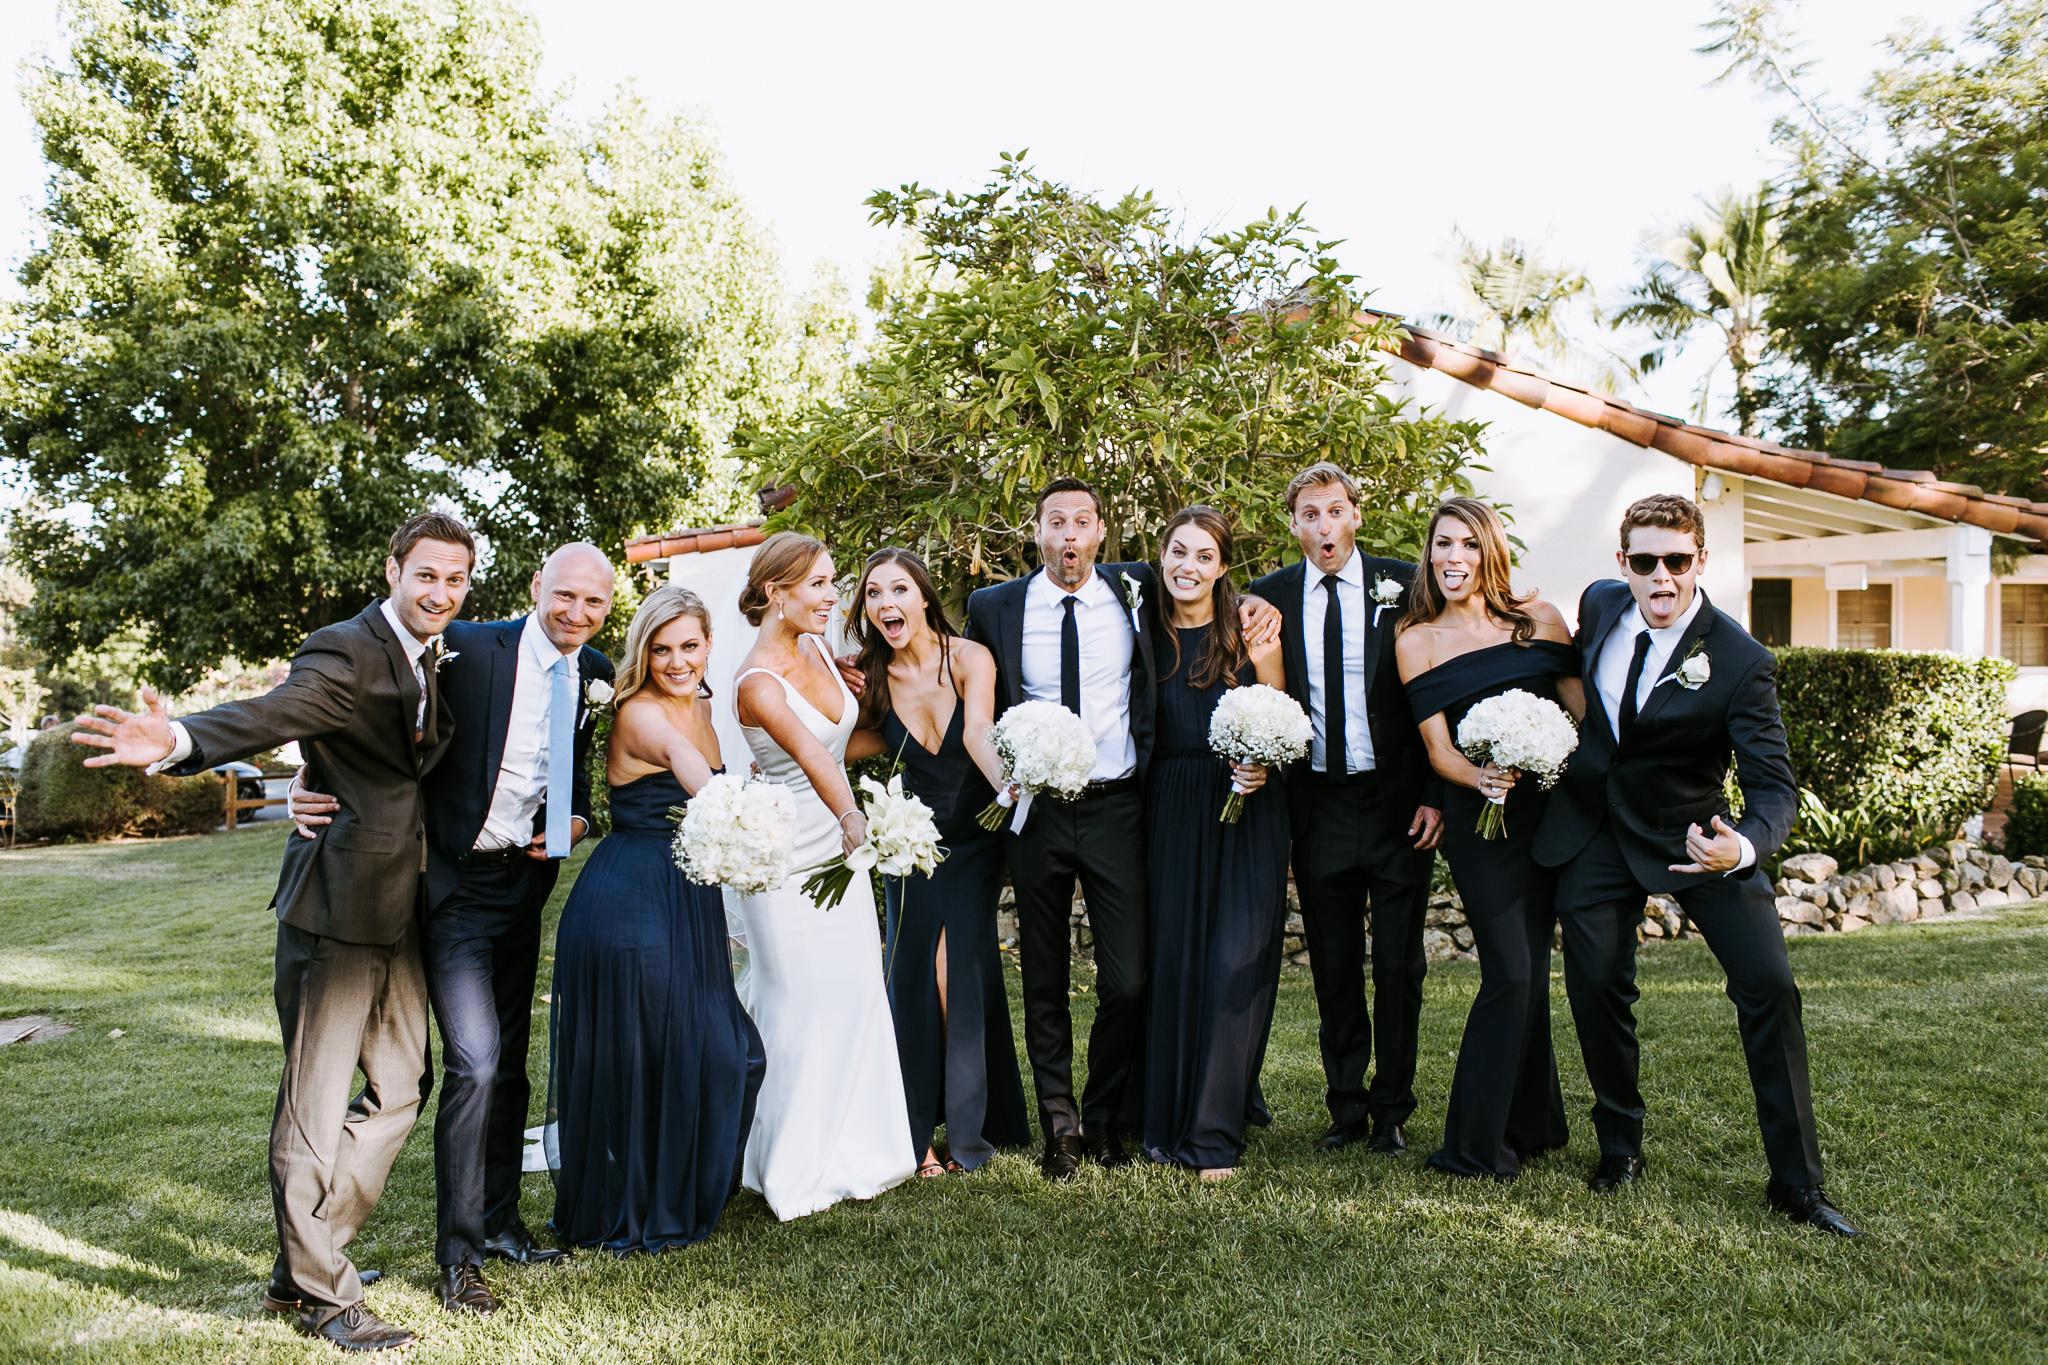 San-Diego-Wedding-Photographer-21.jpg